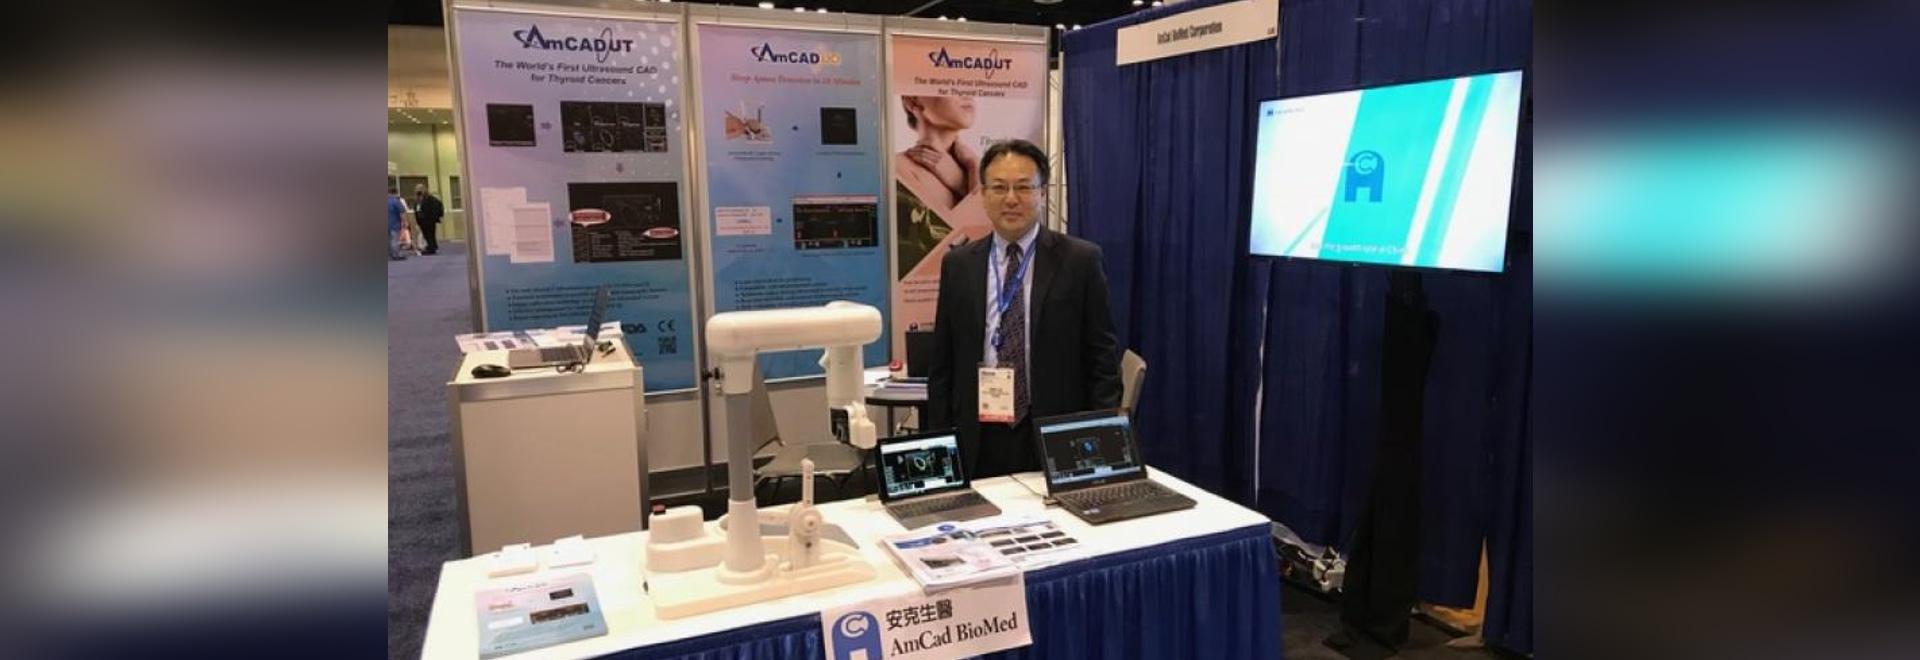 AmCad BioMed Corp. at the Florida International Medical Expo